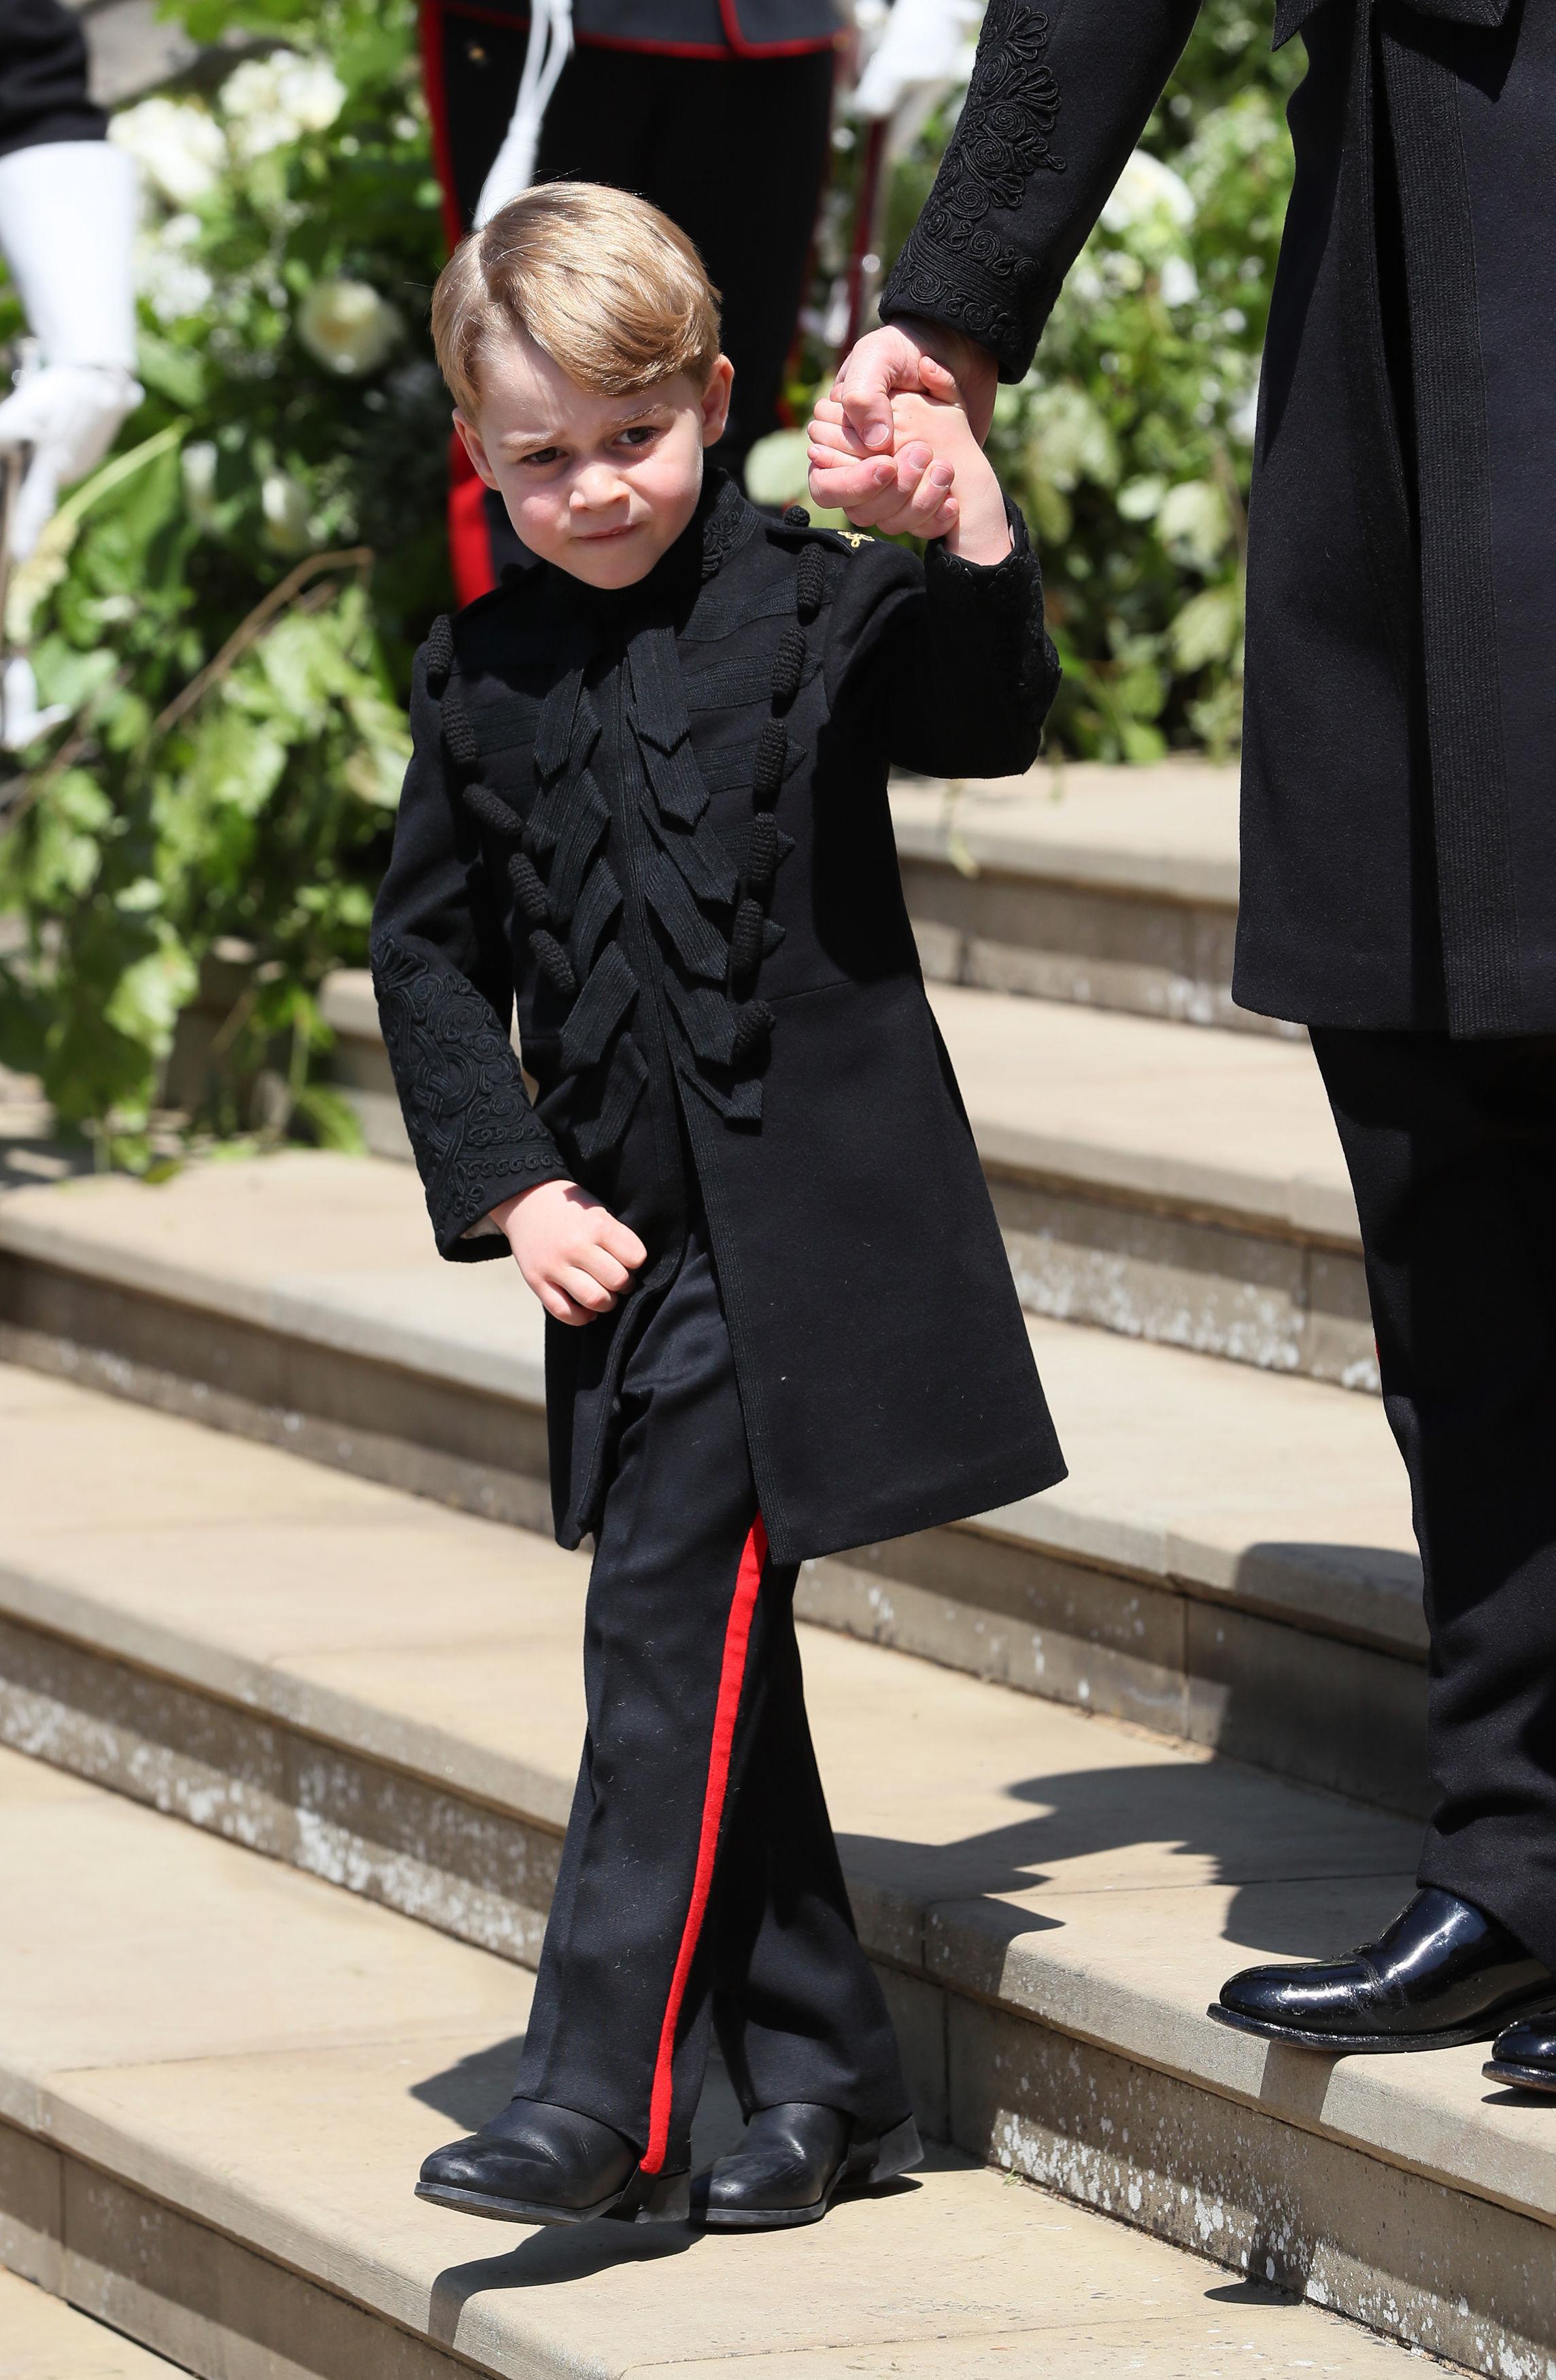 Principe George, mejor vestido, realeza